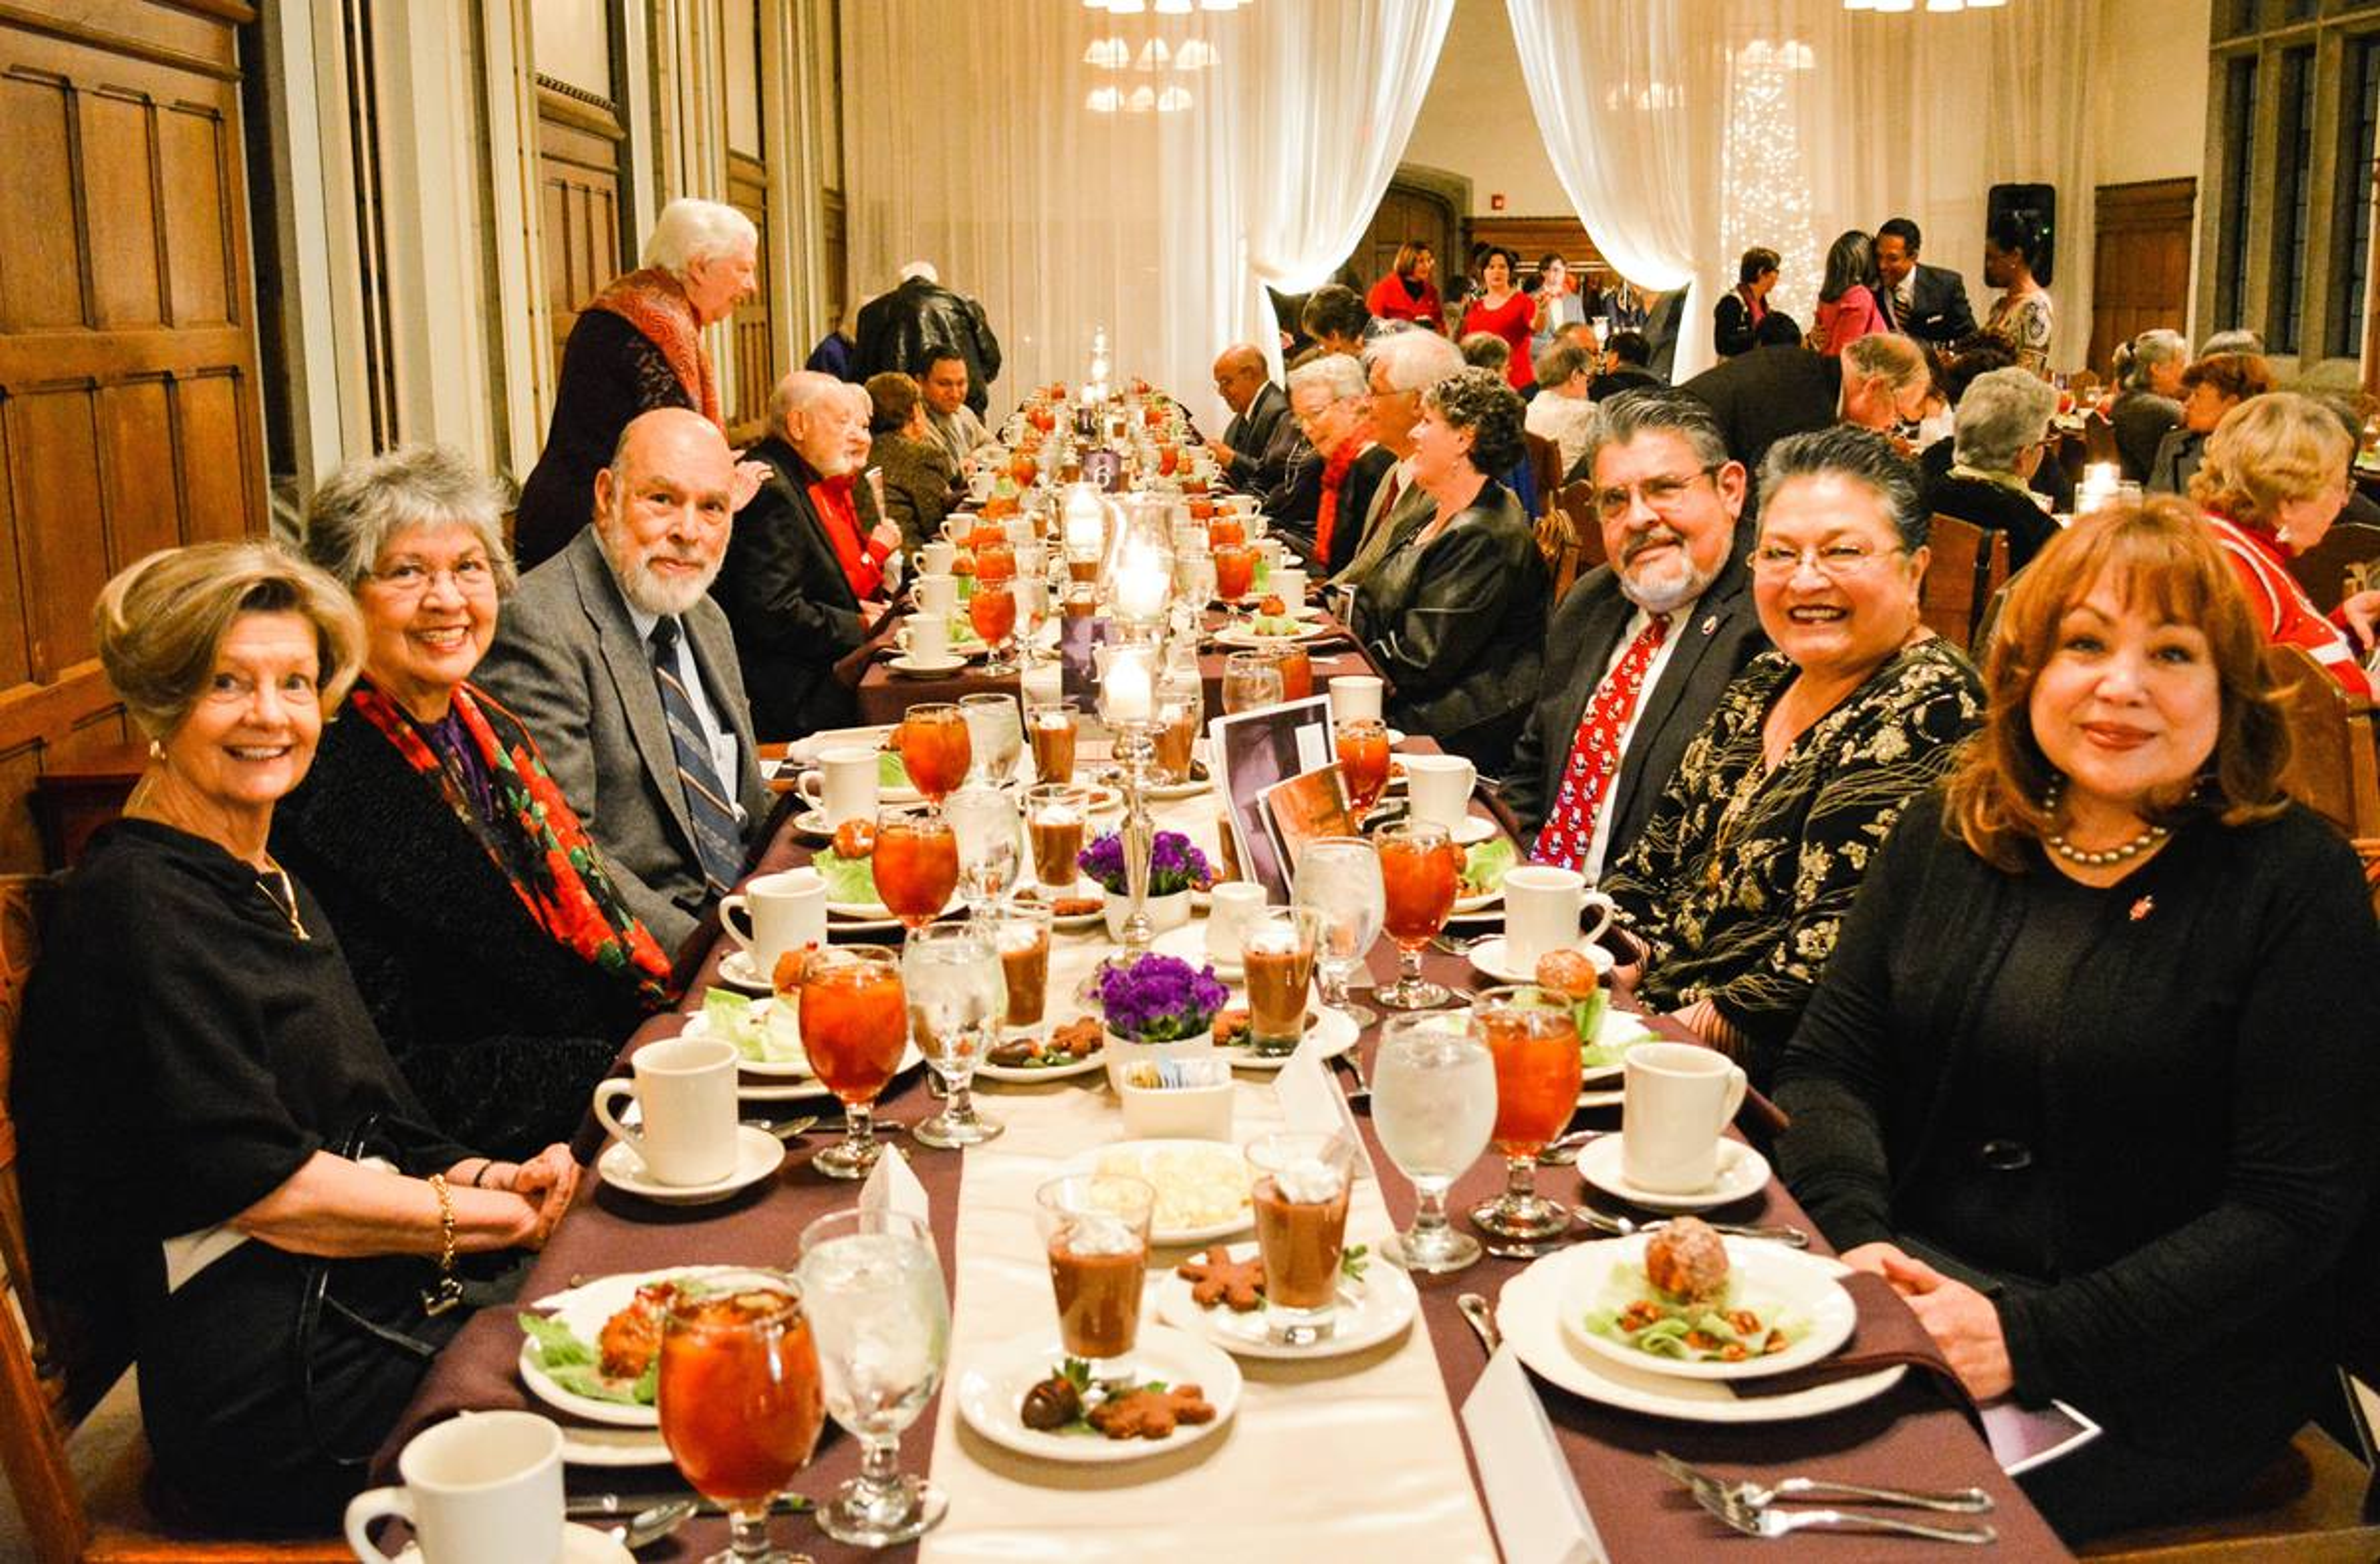 (From left) Jane Bucher, Pauline Alvirez, David Alvirez, Raul Alegria, Bilha Alegria, Bishop Minerva Carcaño are a few of the attendees of the Dec. 6 awards dinner at Scarritt Bennett.